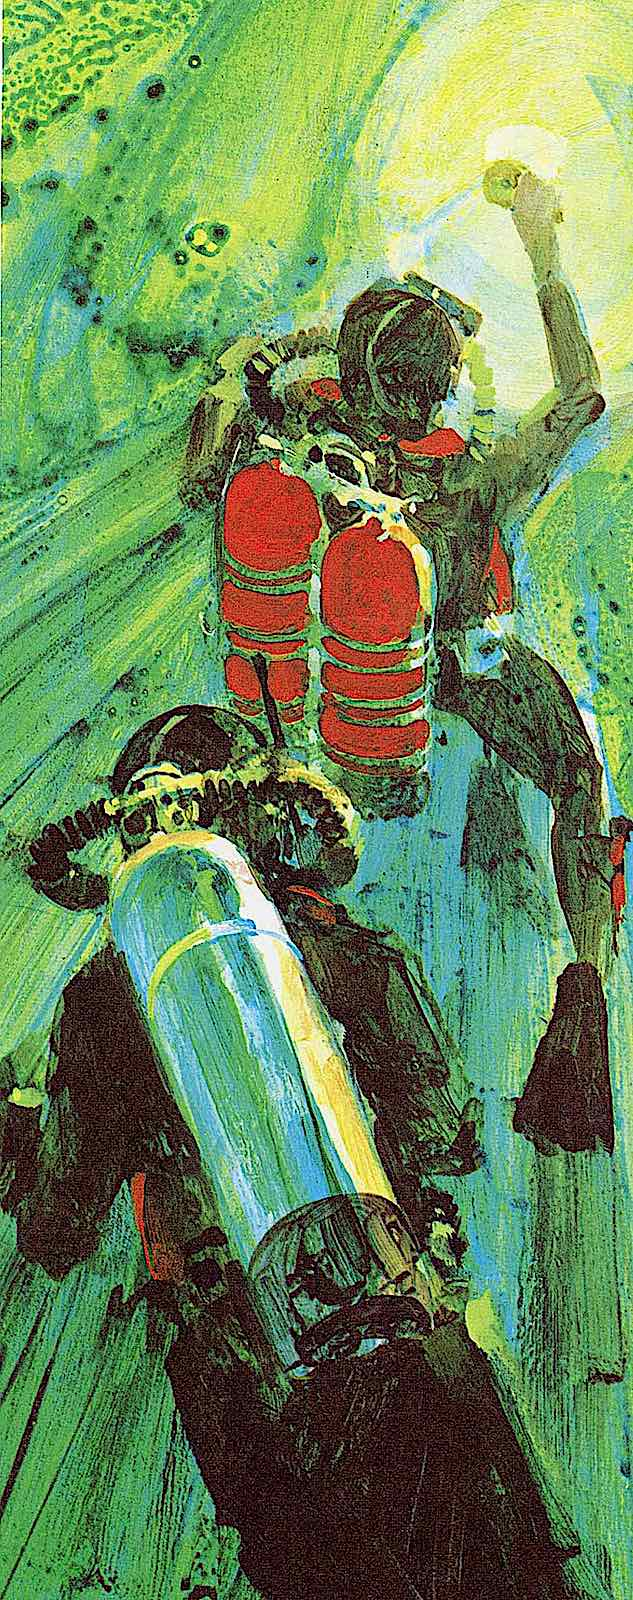 a 1970 illustration of scuba divers